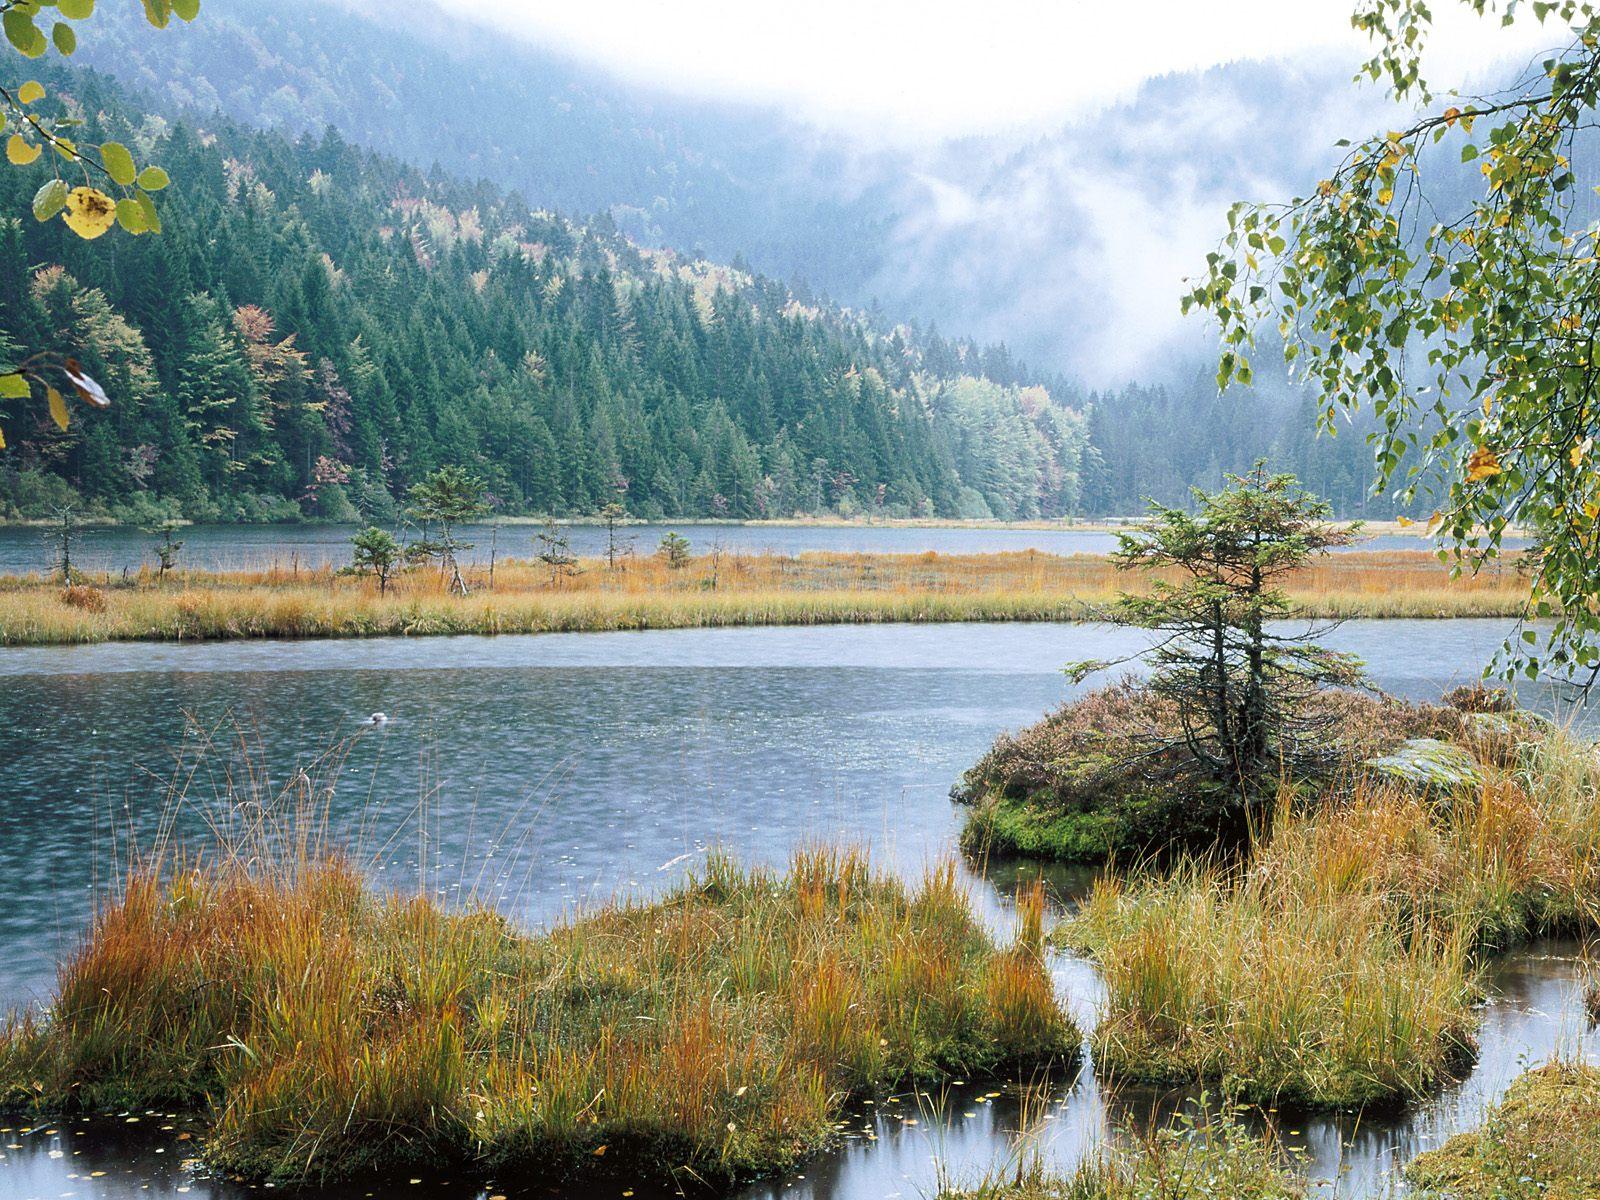 http://3.bp.blogspot.com/-vSwJwp7bGAo/ThFybV2wpvI/AAAAAAAABwk/c1oKp1NBUhI/s1600/Small+Arber+Lake%252C+Bavarian+Forest%252C+Germany.jpg